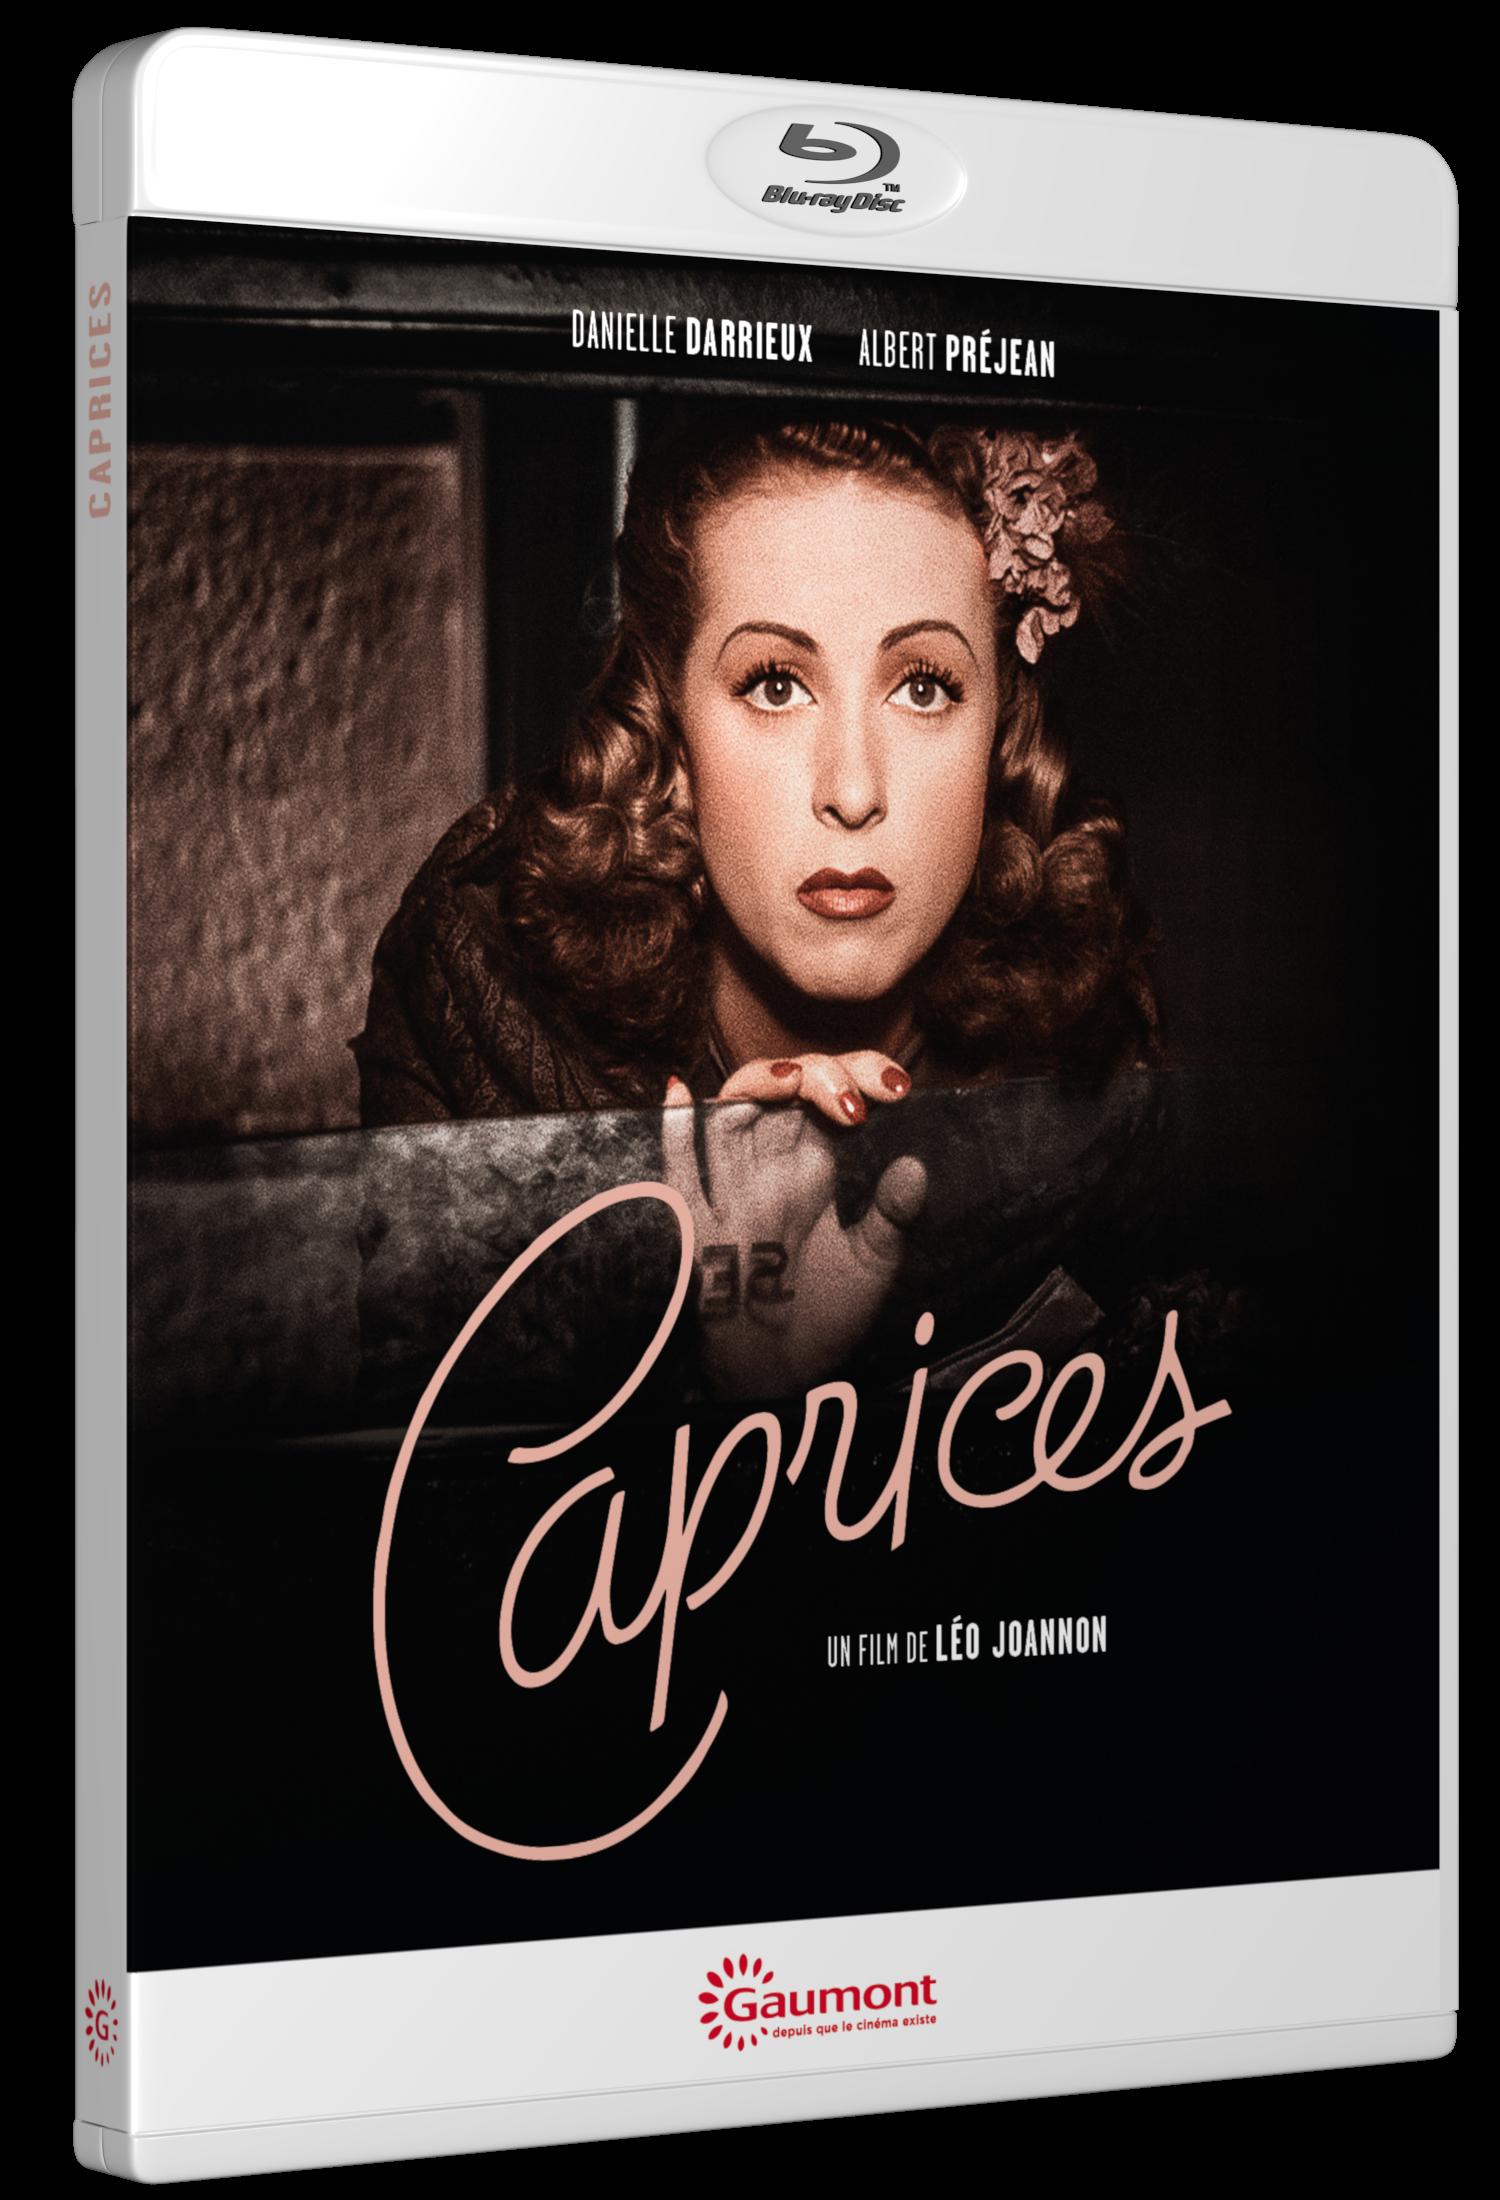 CAPRICES - BRD